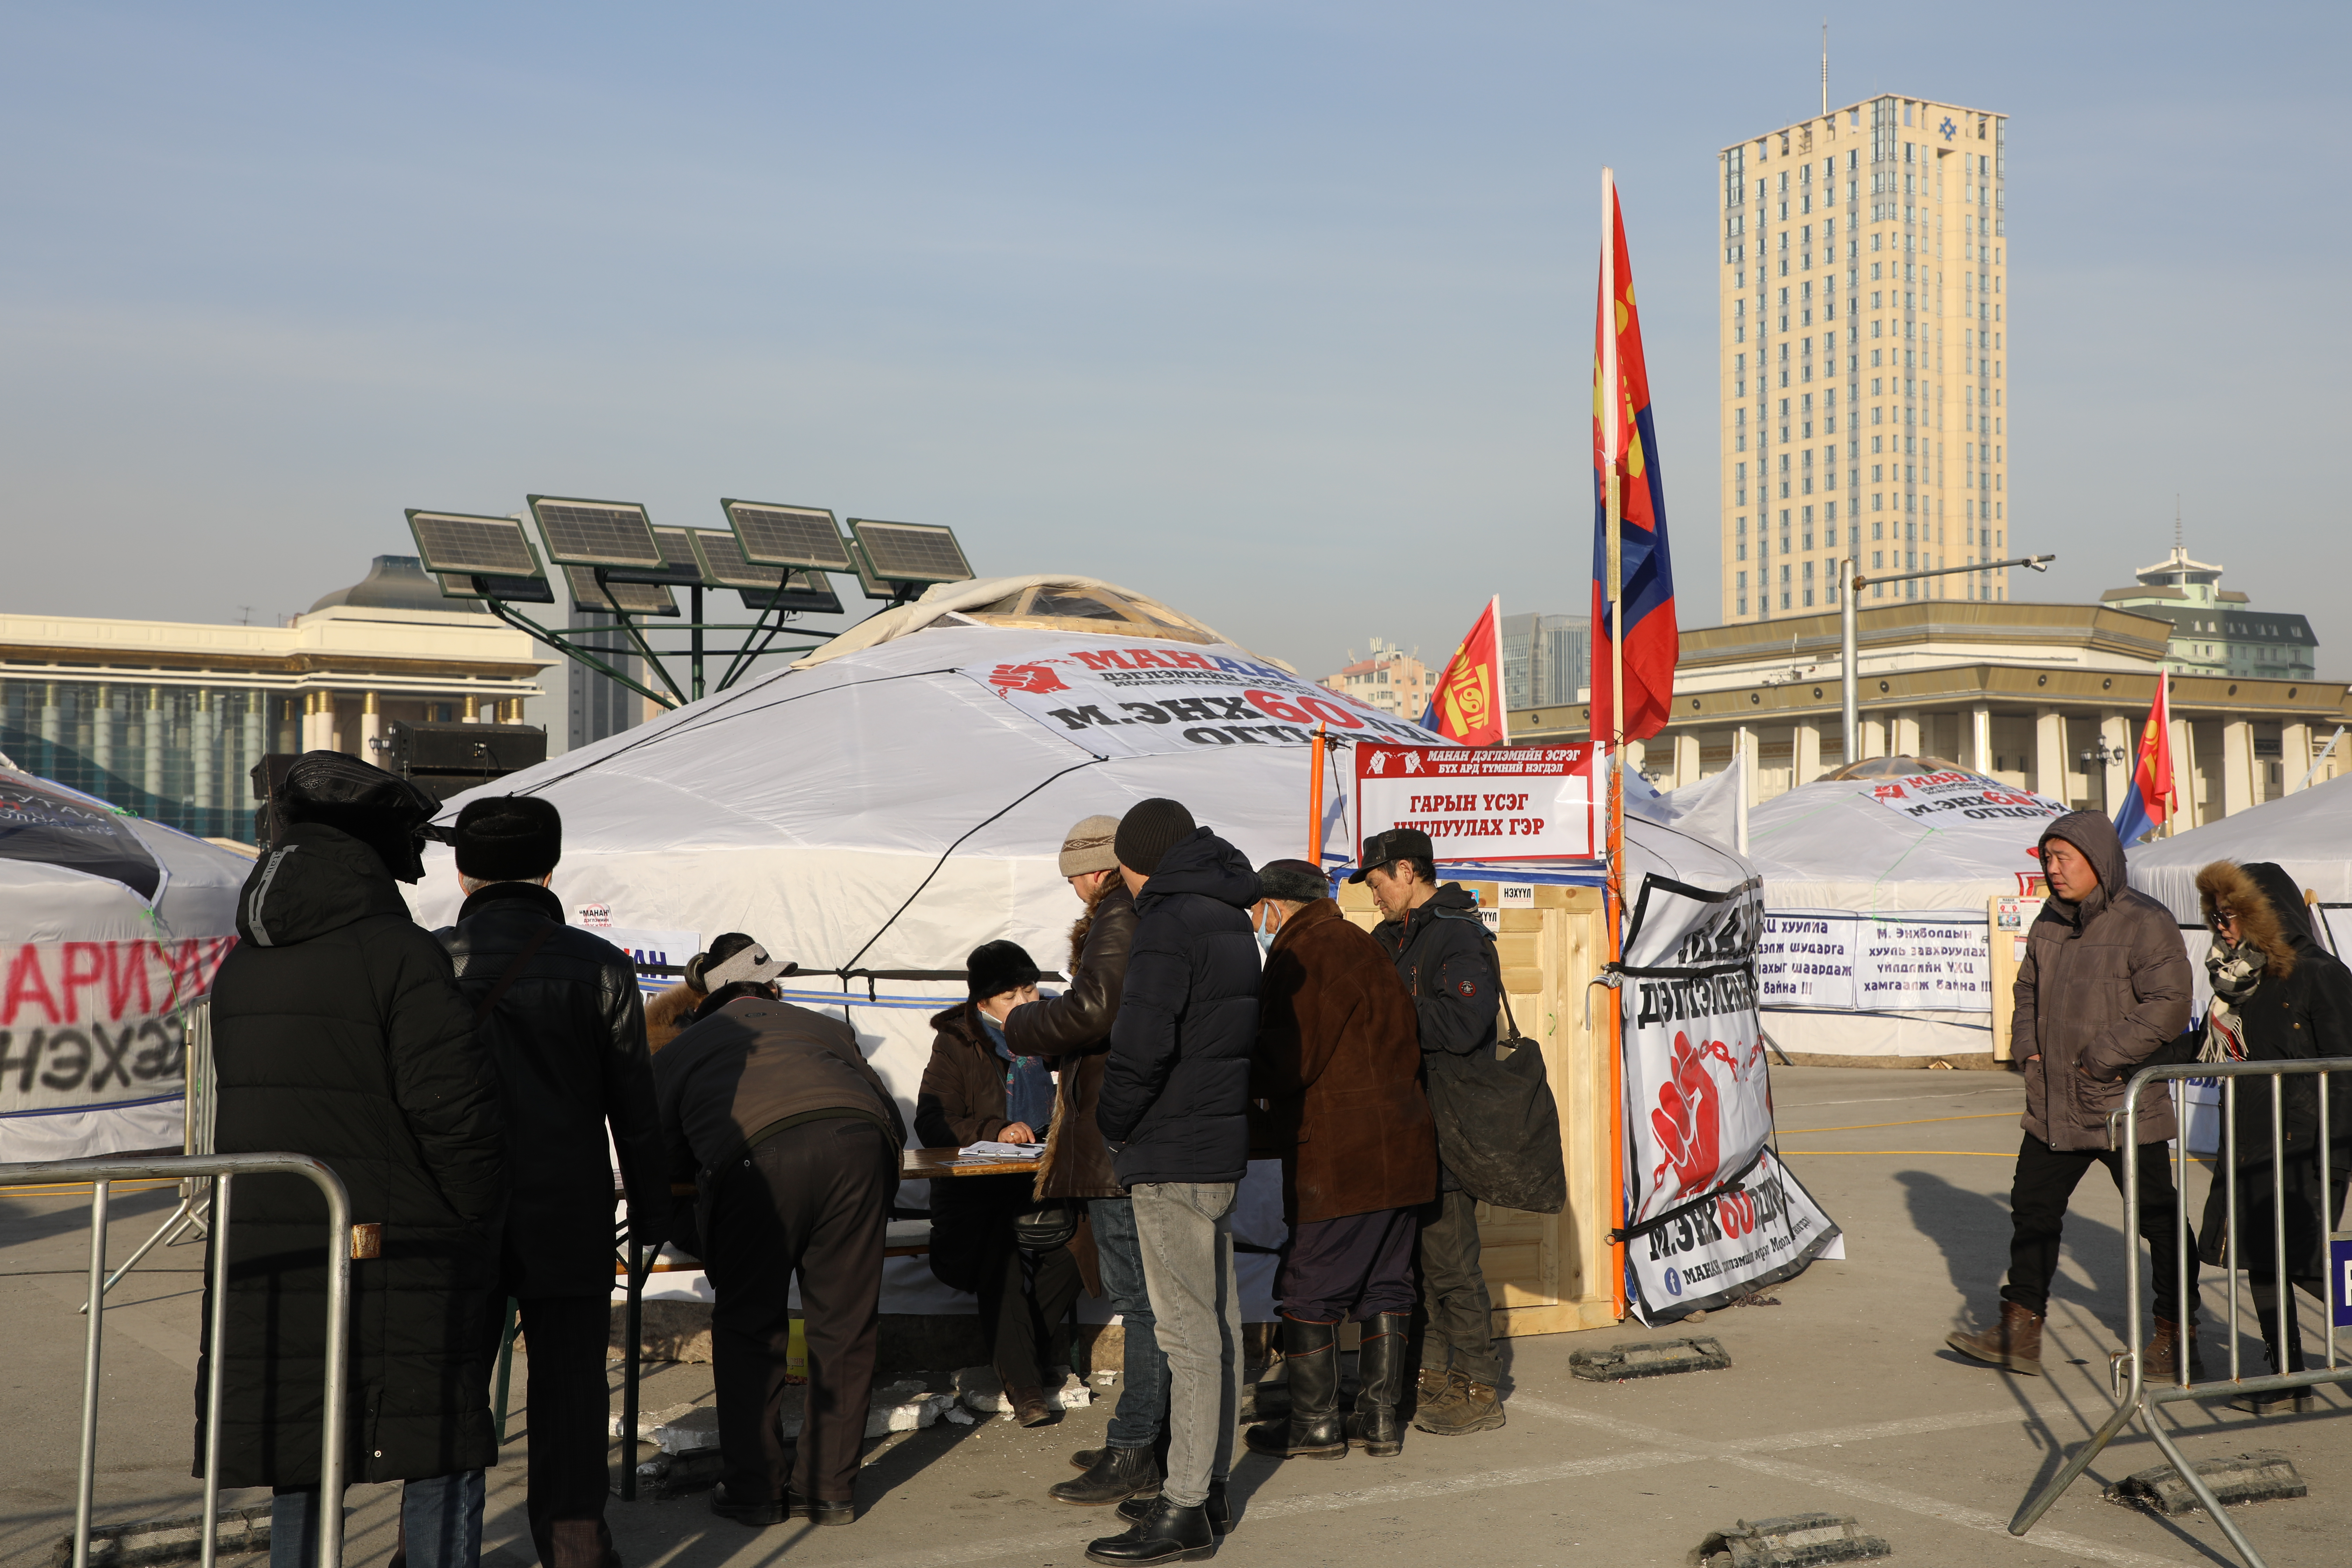 Mongolia's March Against Corruption